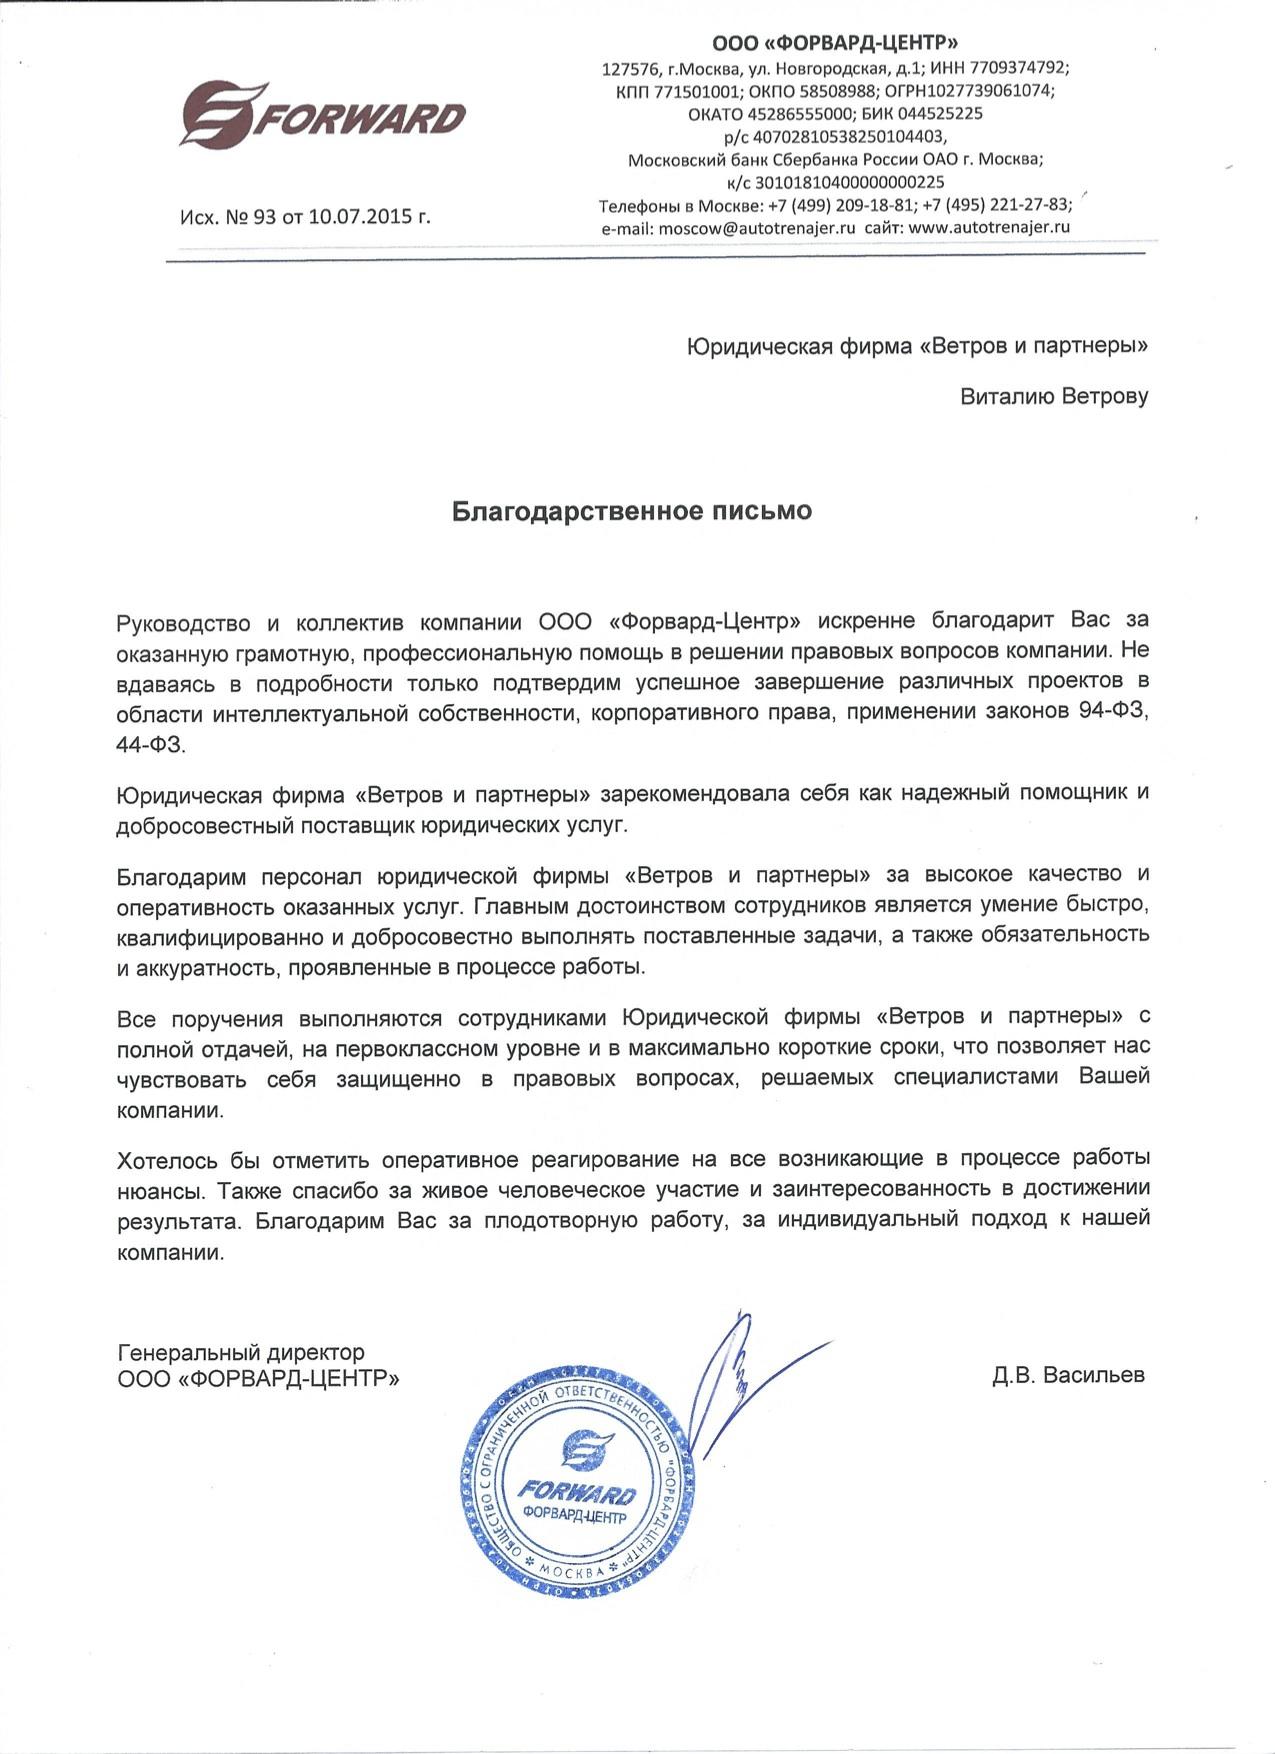 Коршунов петр николаевич судья